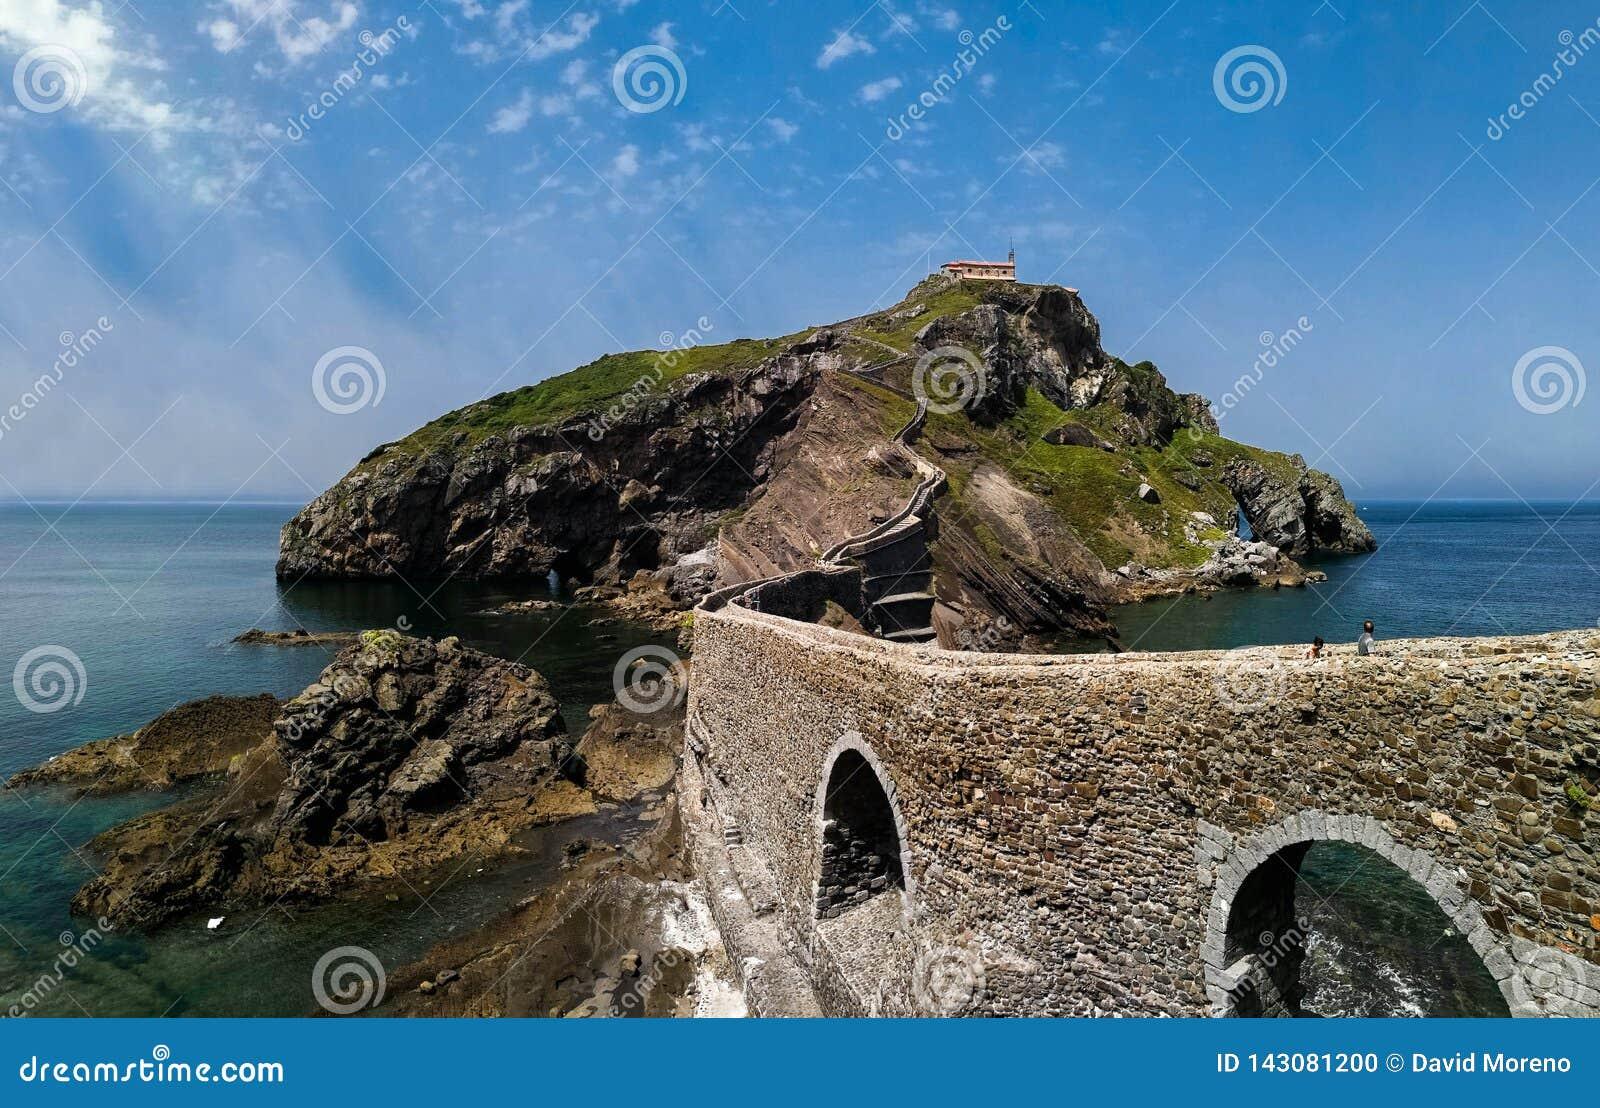 Paesaggio scenico di San Juan de Gaztelugatxe, Paese Basco, Spagna